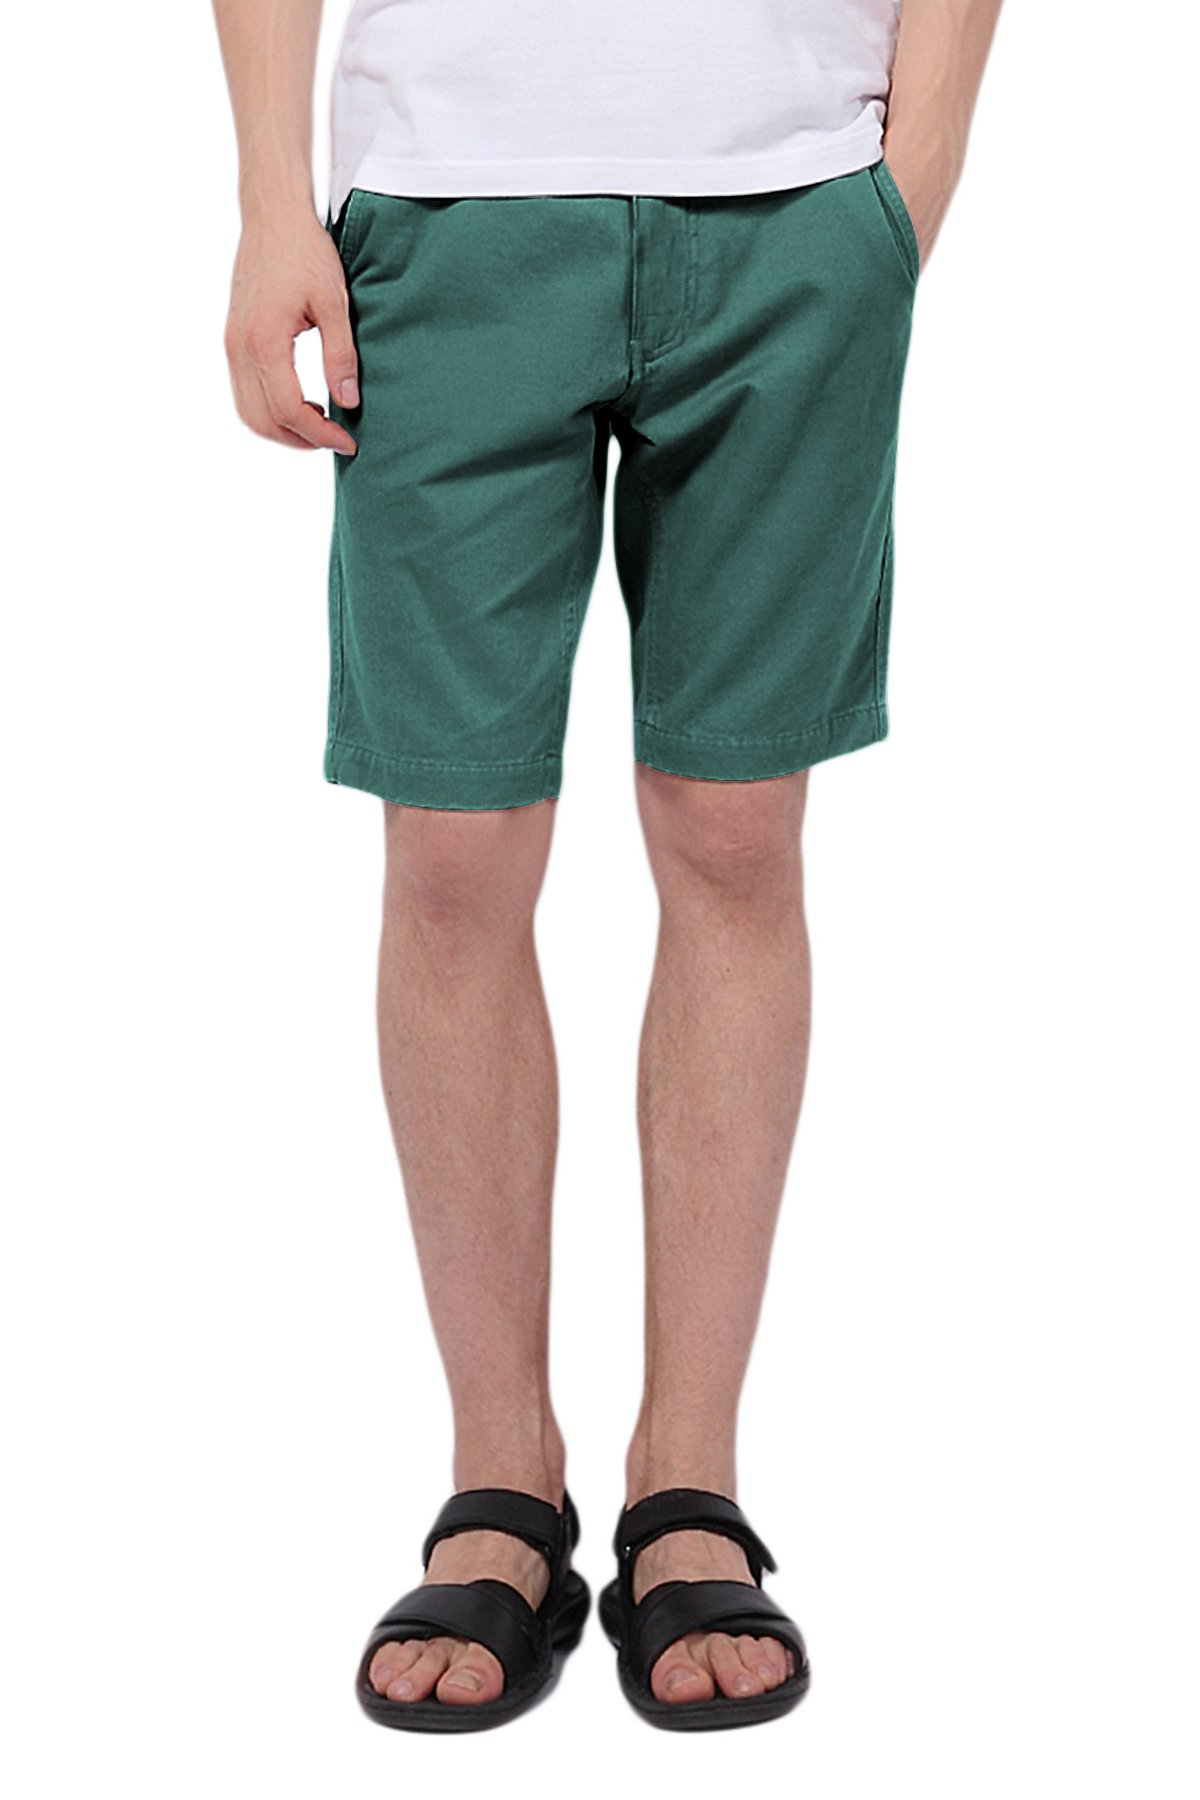 Pau1Hami1ton PH-01 Men's Chino Casual Shorts Slim Fit(34 Green Blue)